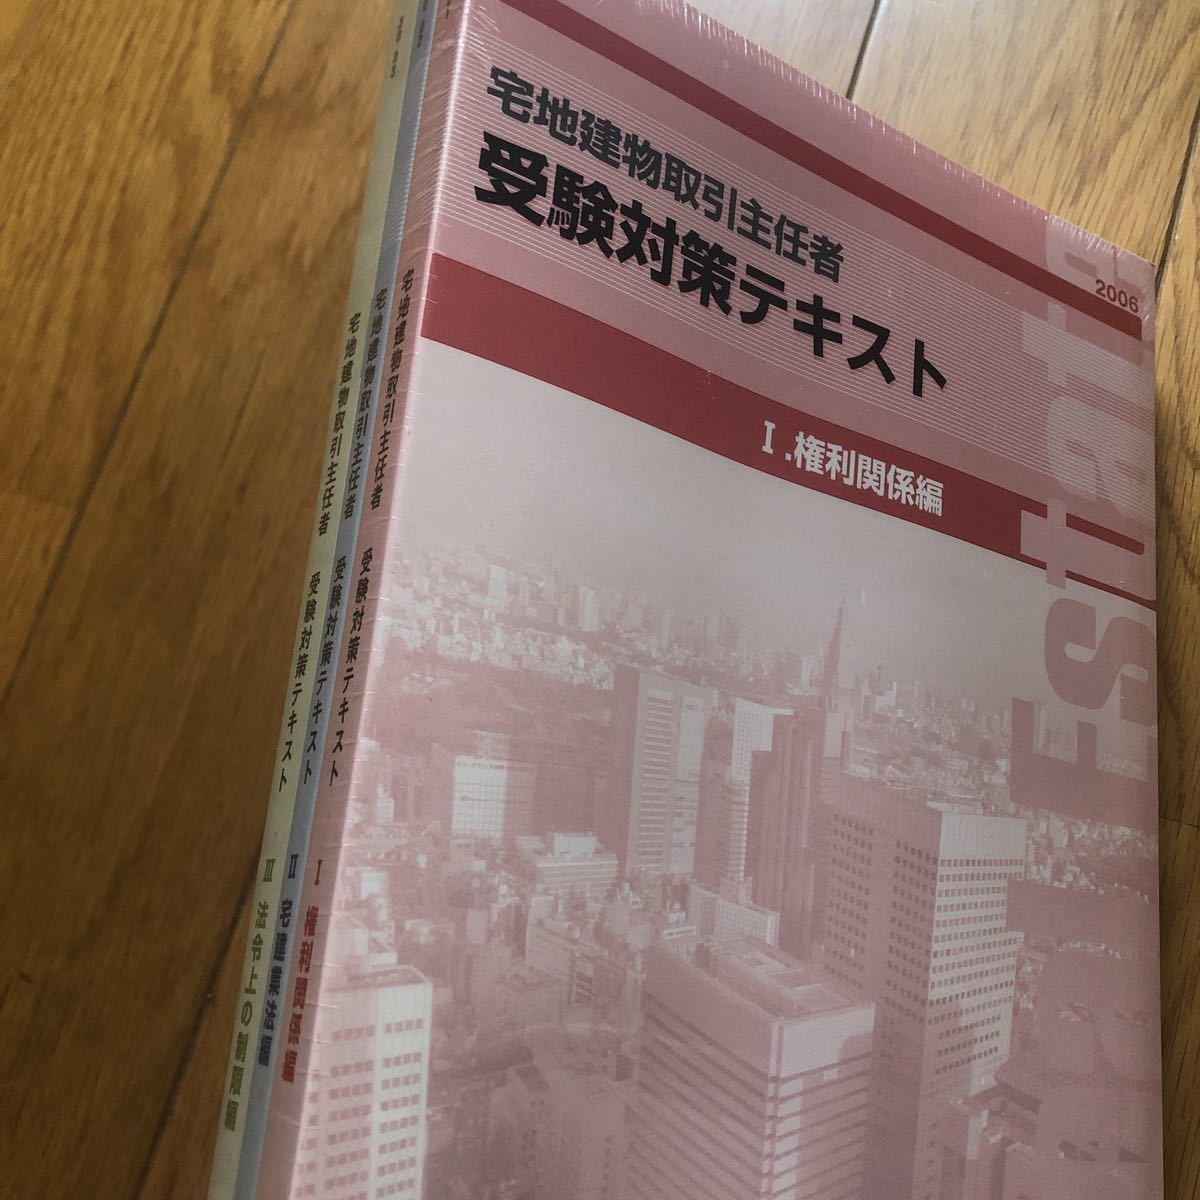 宅地建物取引主任者 受験対策テキスト 権利関係 宅建業法 法令上の制限 3冊セット 日建学院